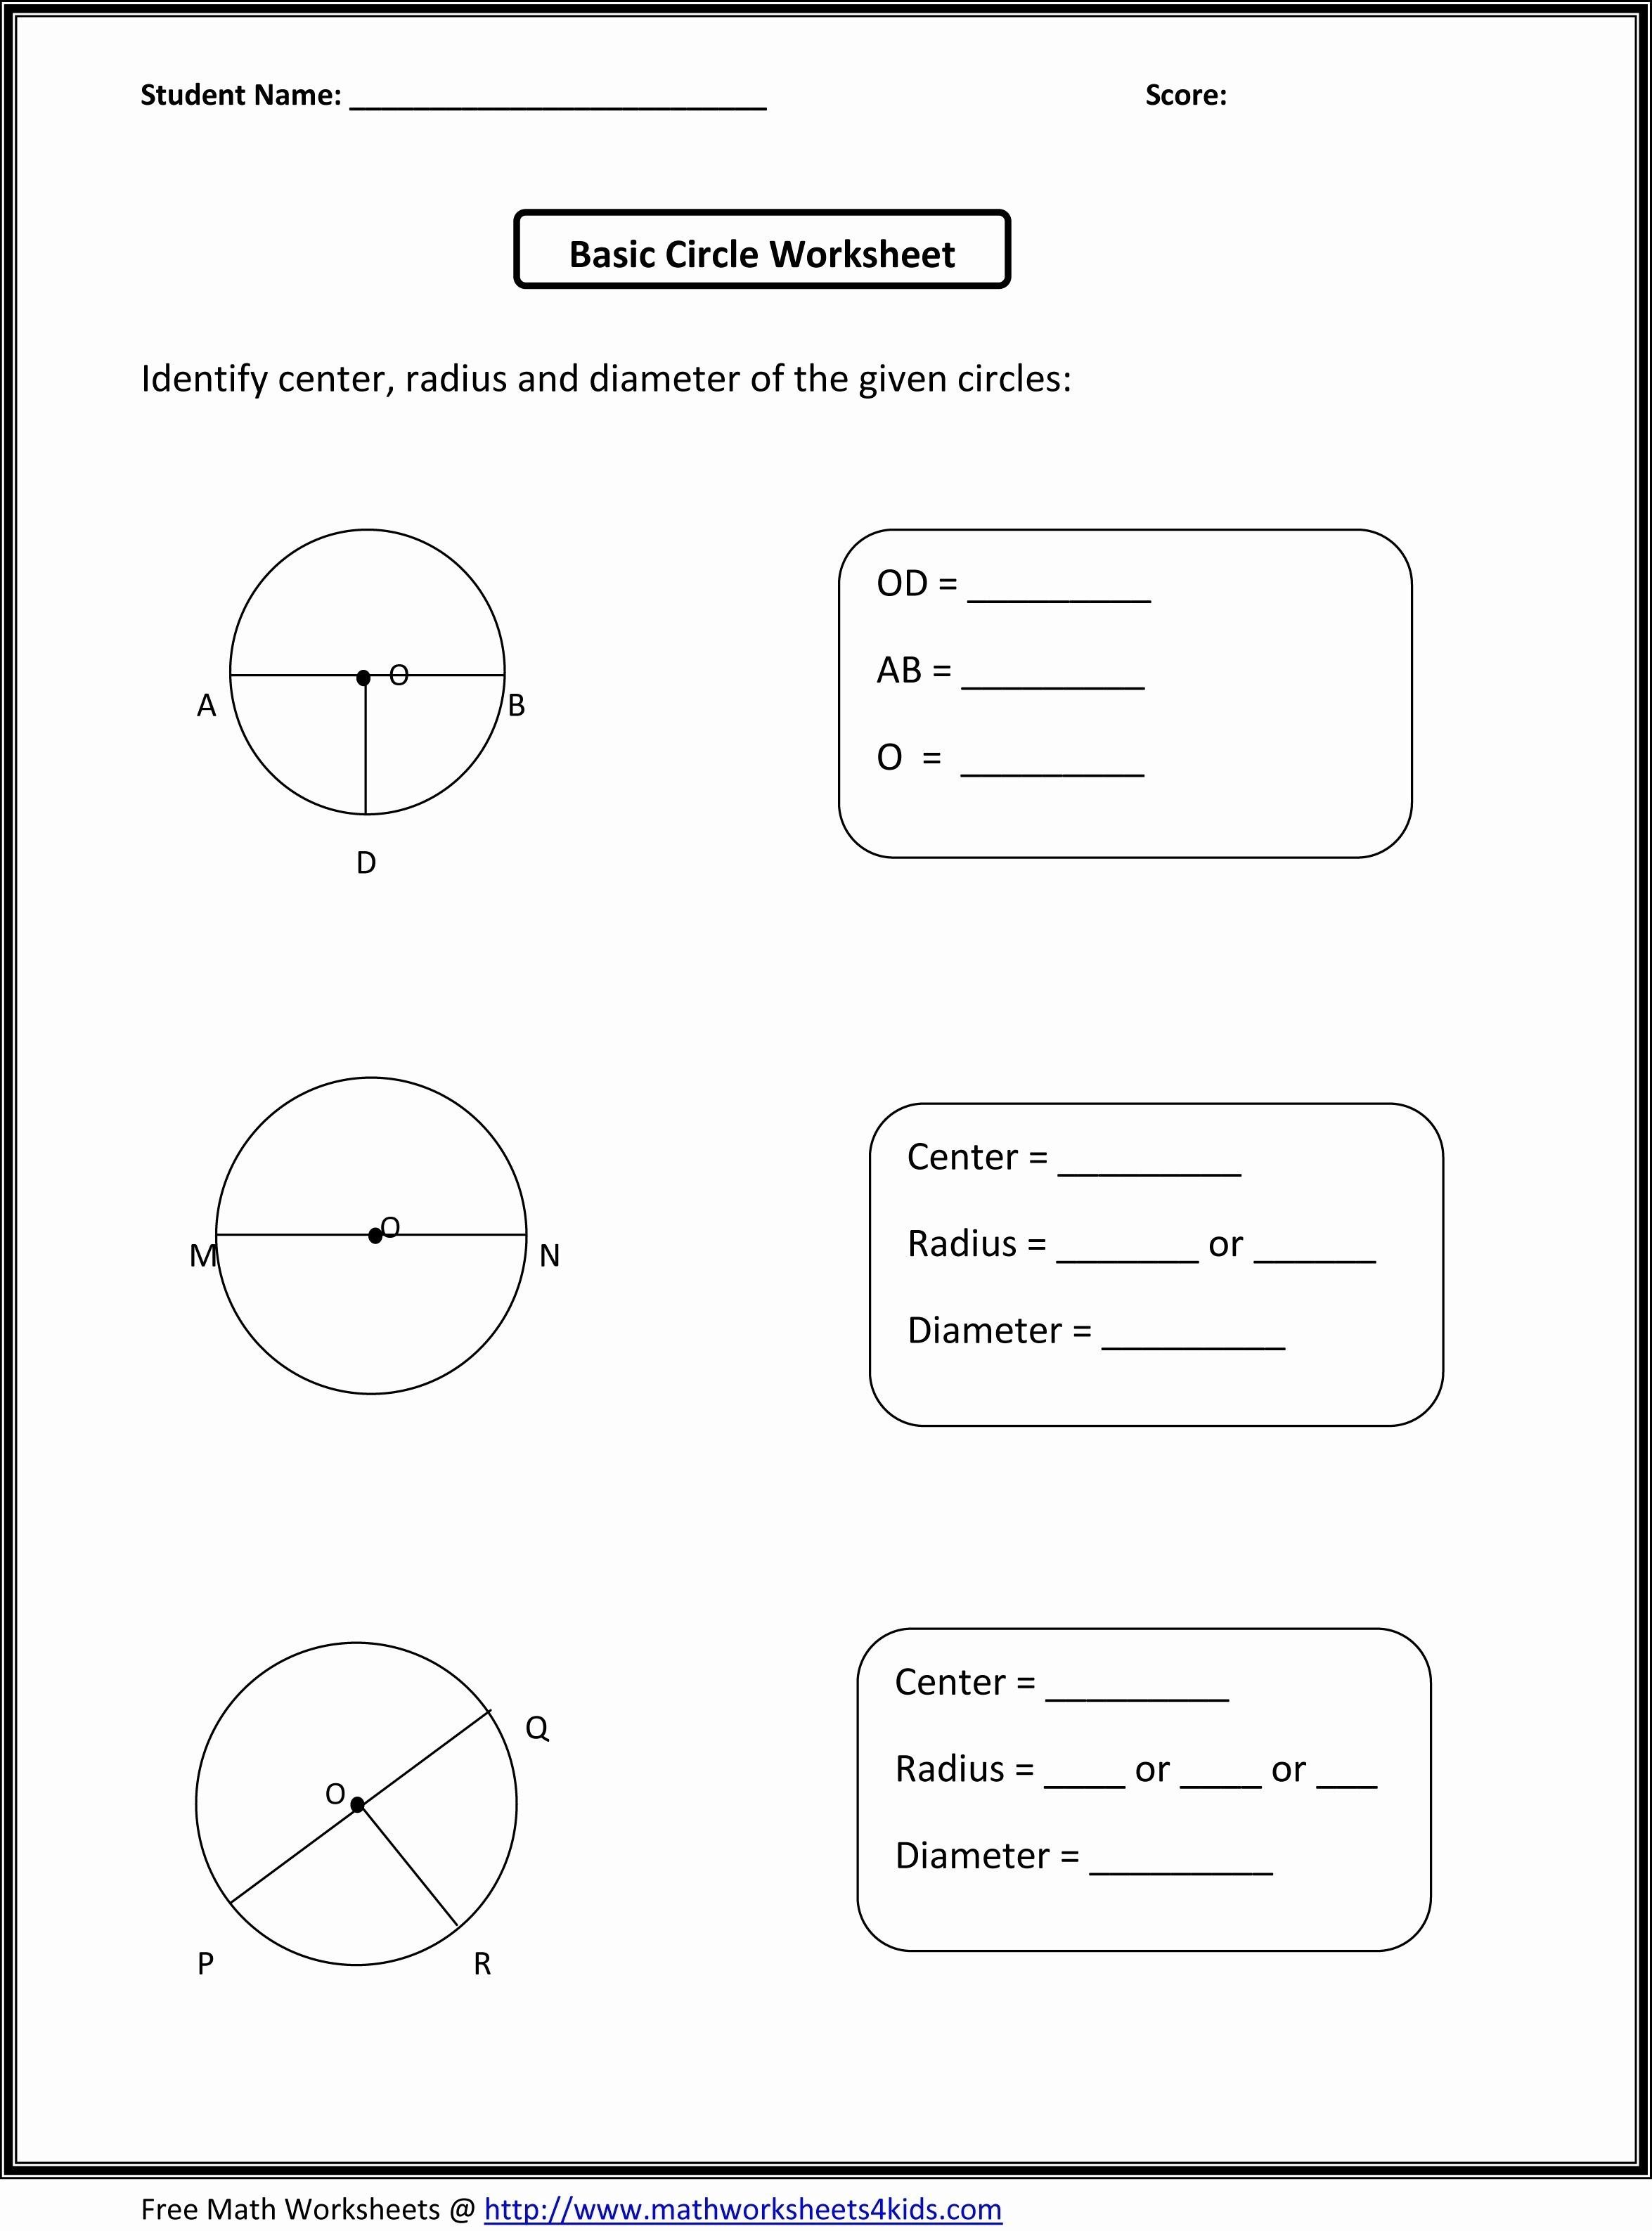 Free Printable Math Worksheets For Grade 6 – Worksheet Template - Free Printable Algebra Worksheets Grade 6